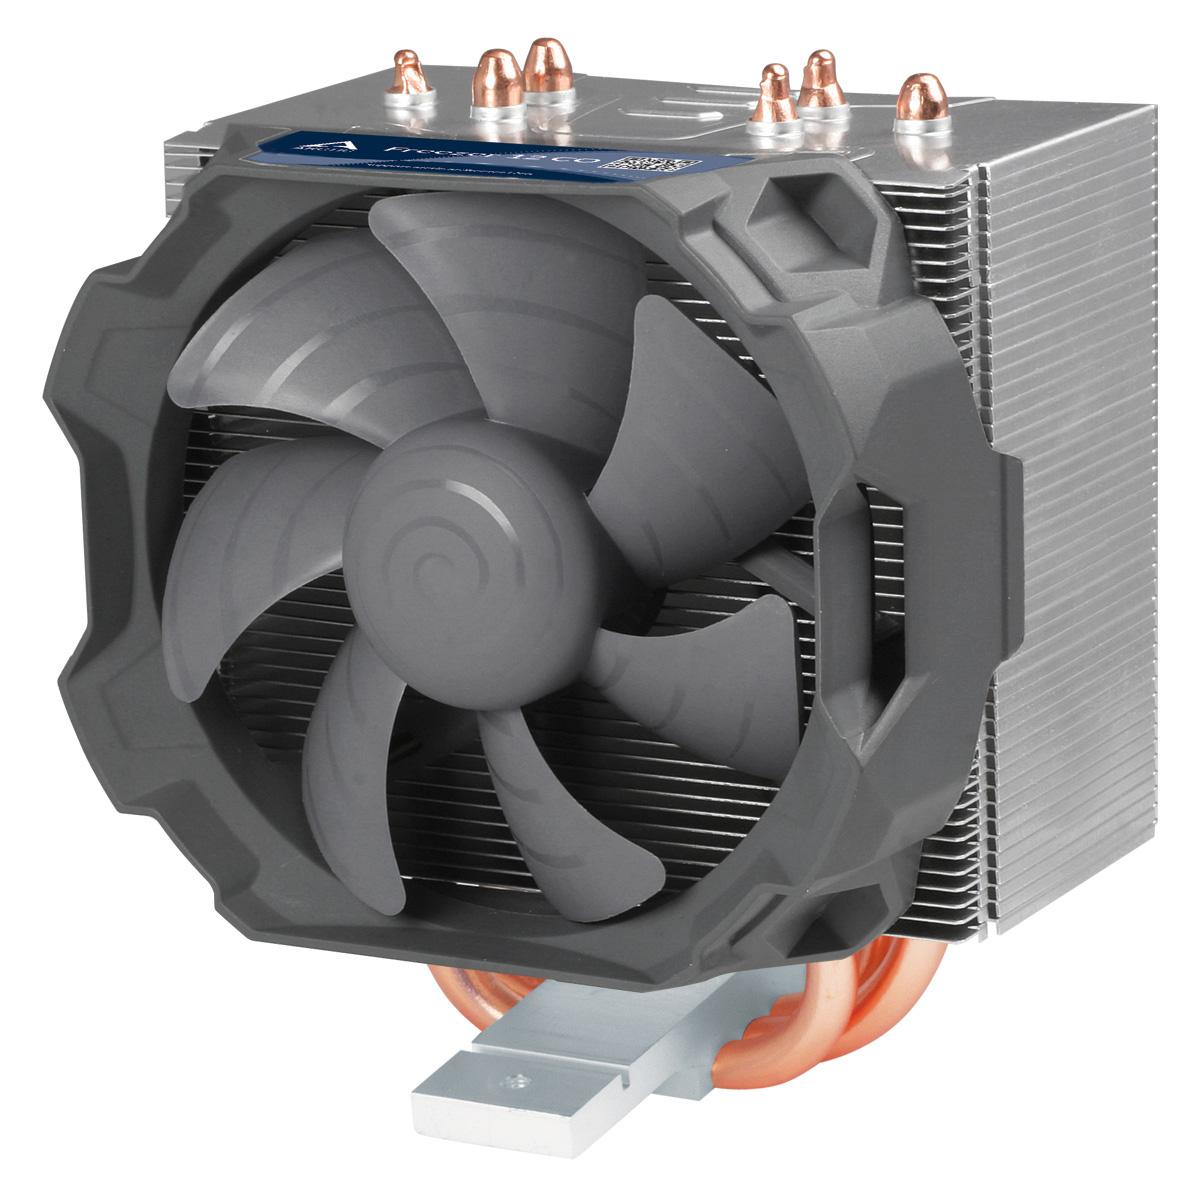 ARCTIC Freezer 12 CO, CPU Cooler for Intel socket 2011(-v3)/1150/1151/1155/1156/2066 & AMD socket AM4, with TDP 150W